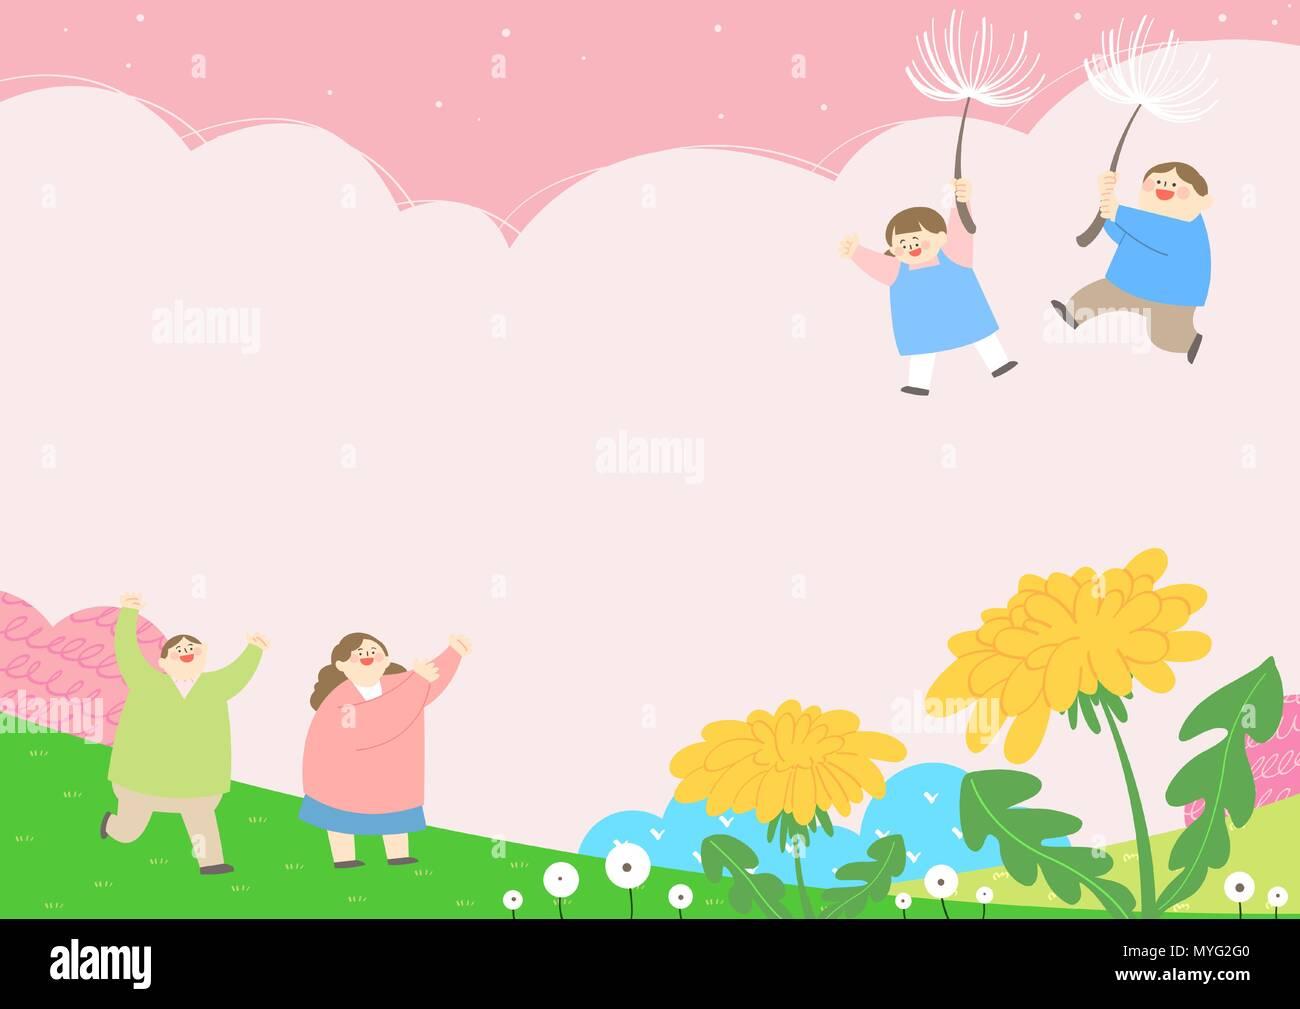 Vector - Welcome spring. Enjoy spring time illustration 002 - Stock Vector